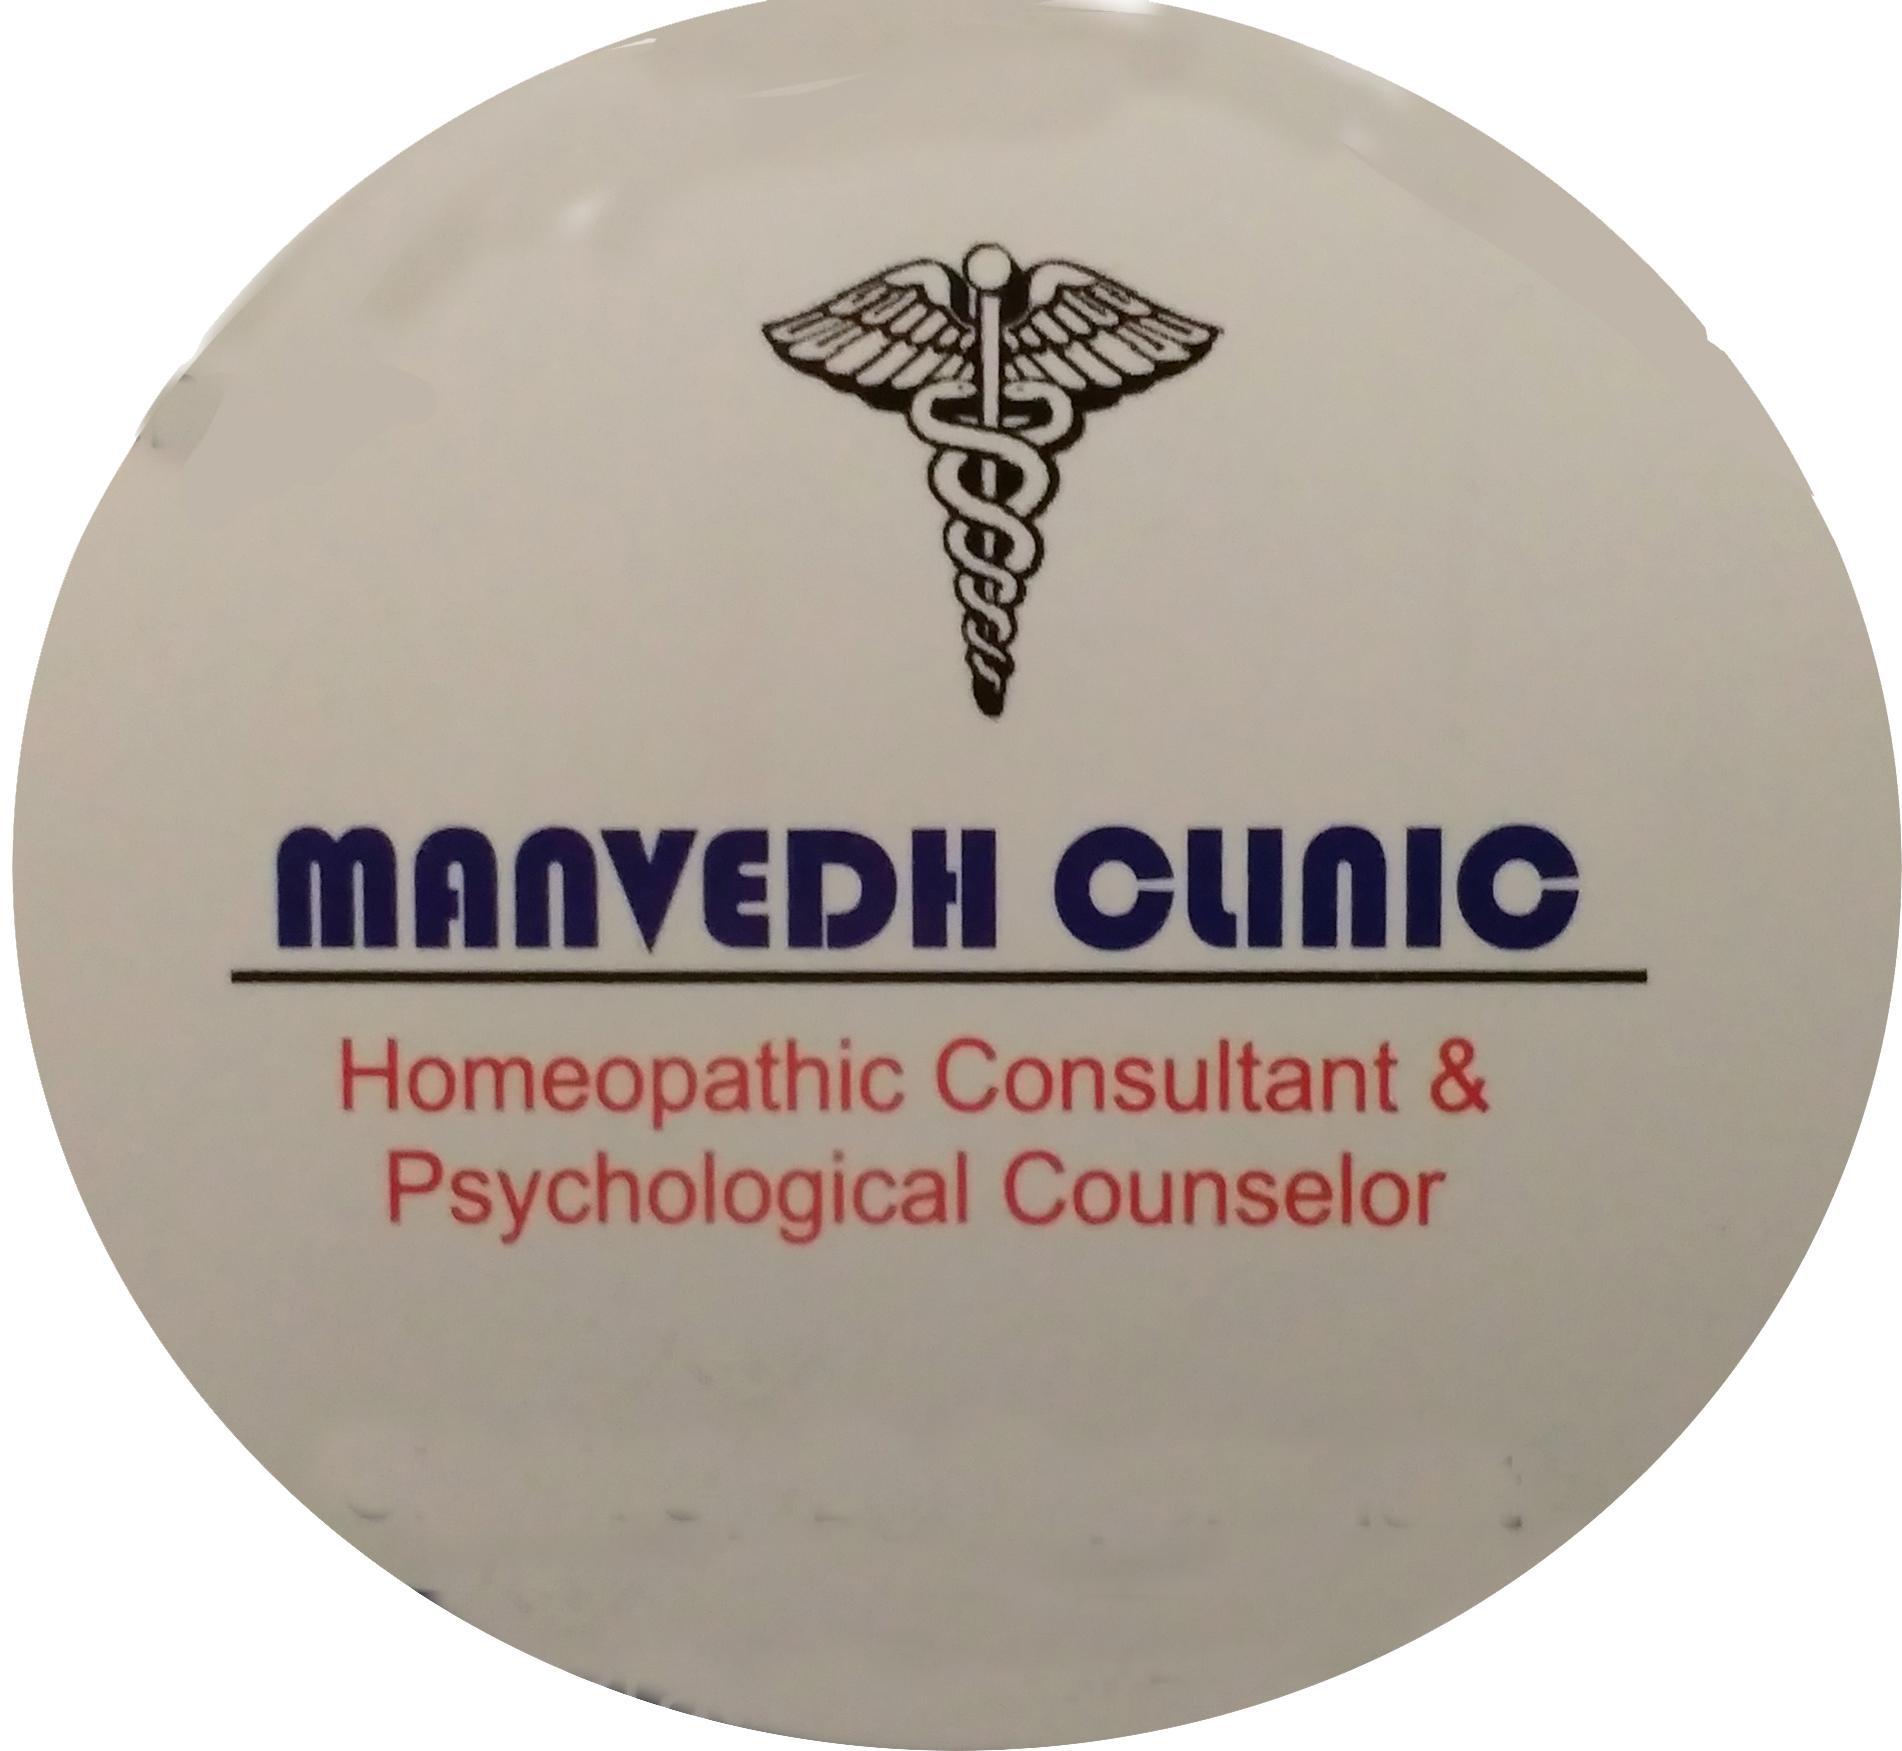 Manvedh Clinic